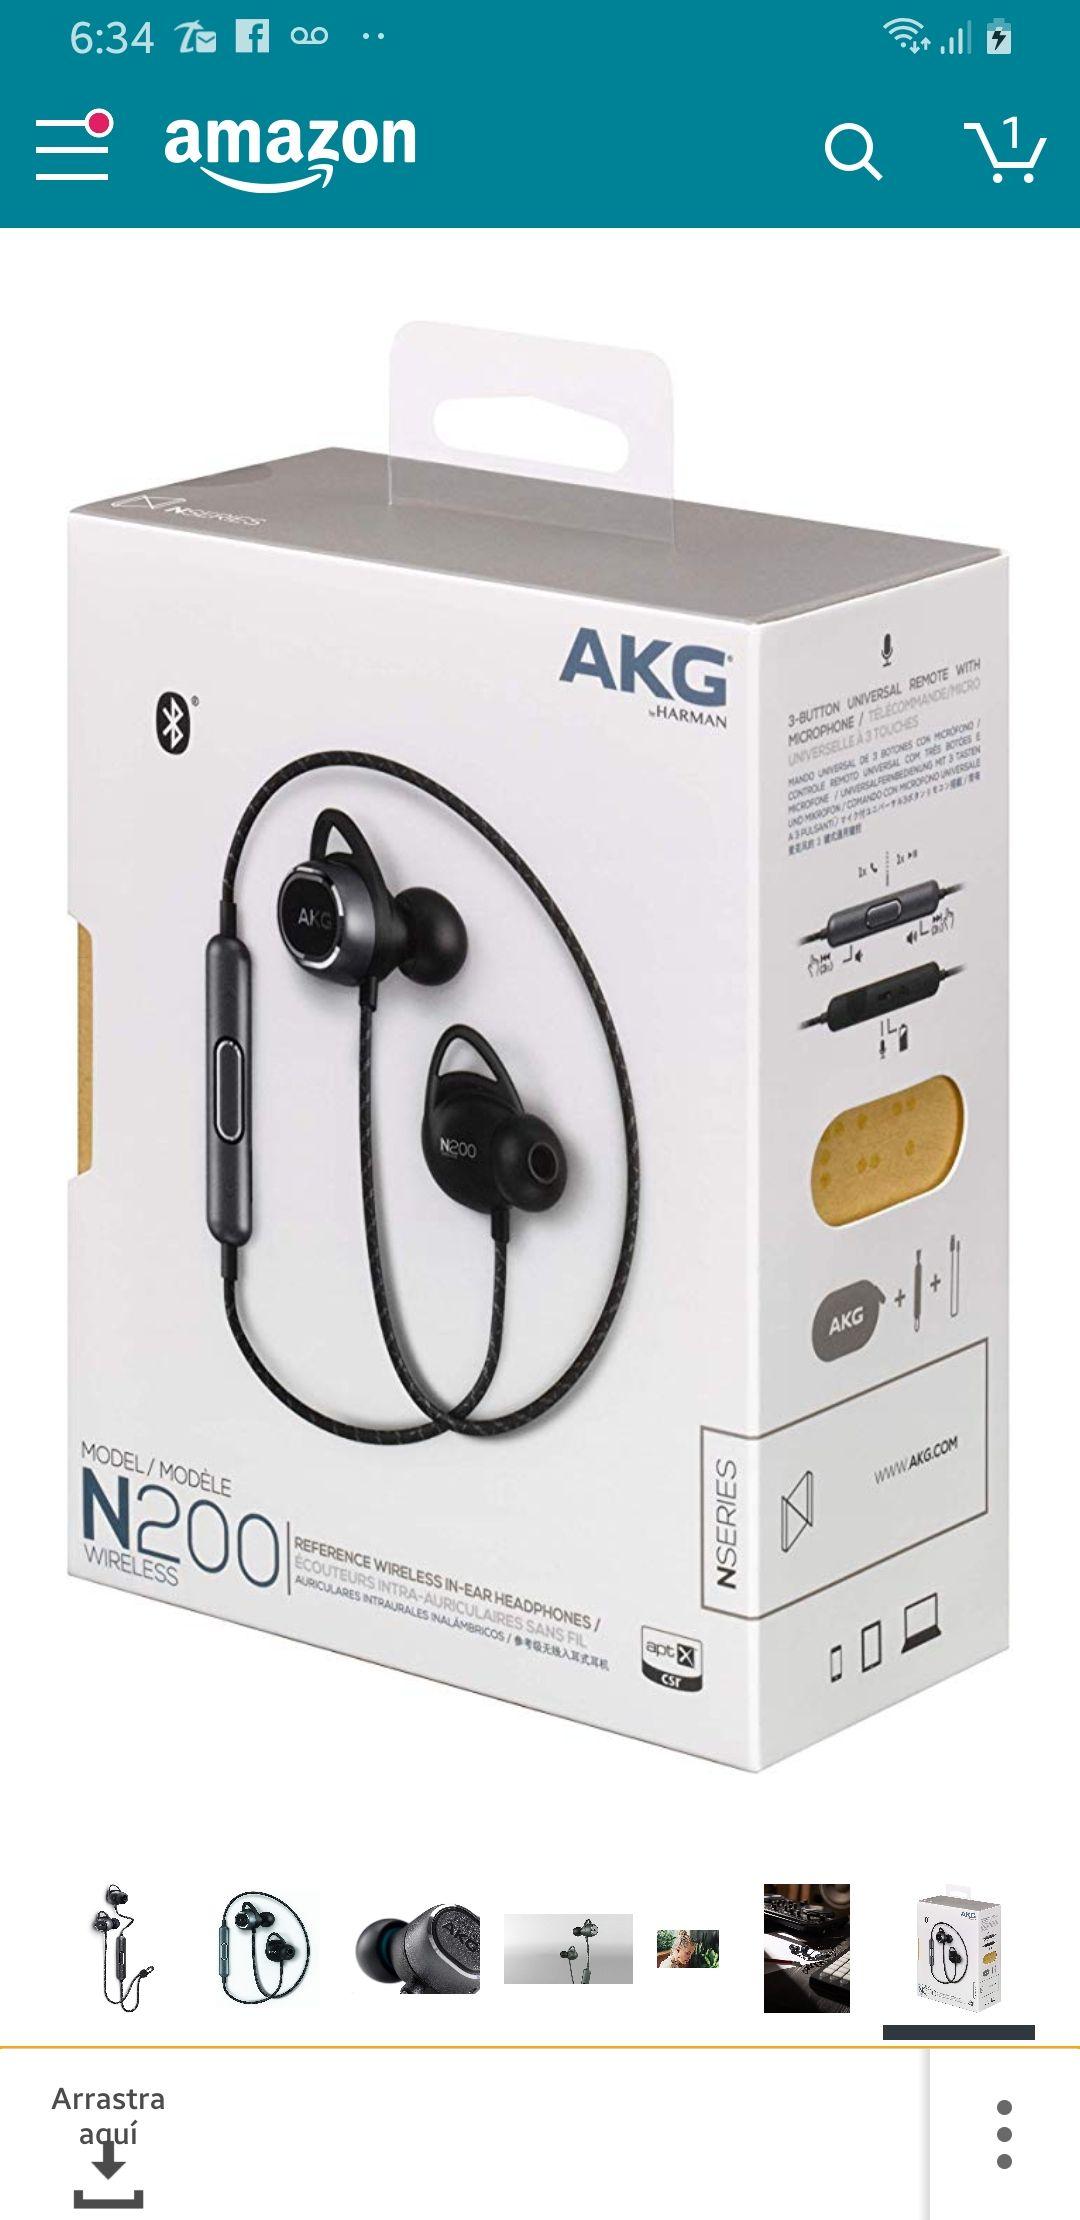 Amazon USA: Audífonos AKG N200